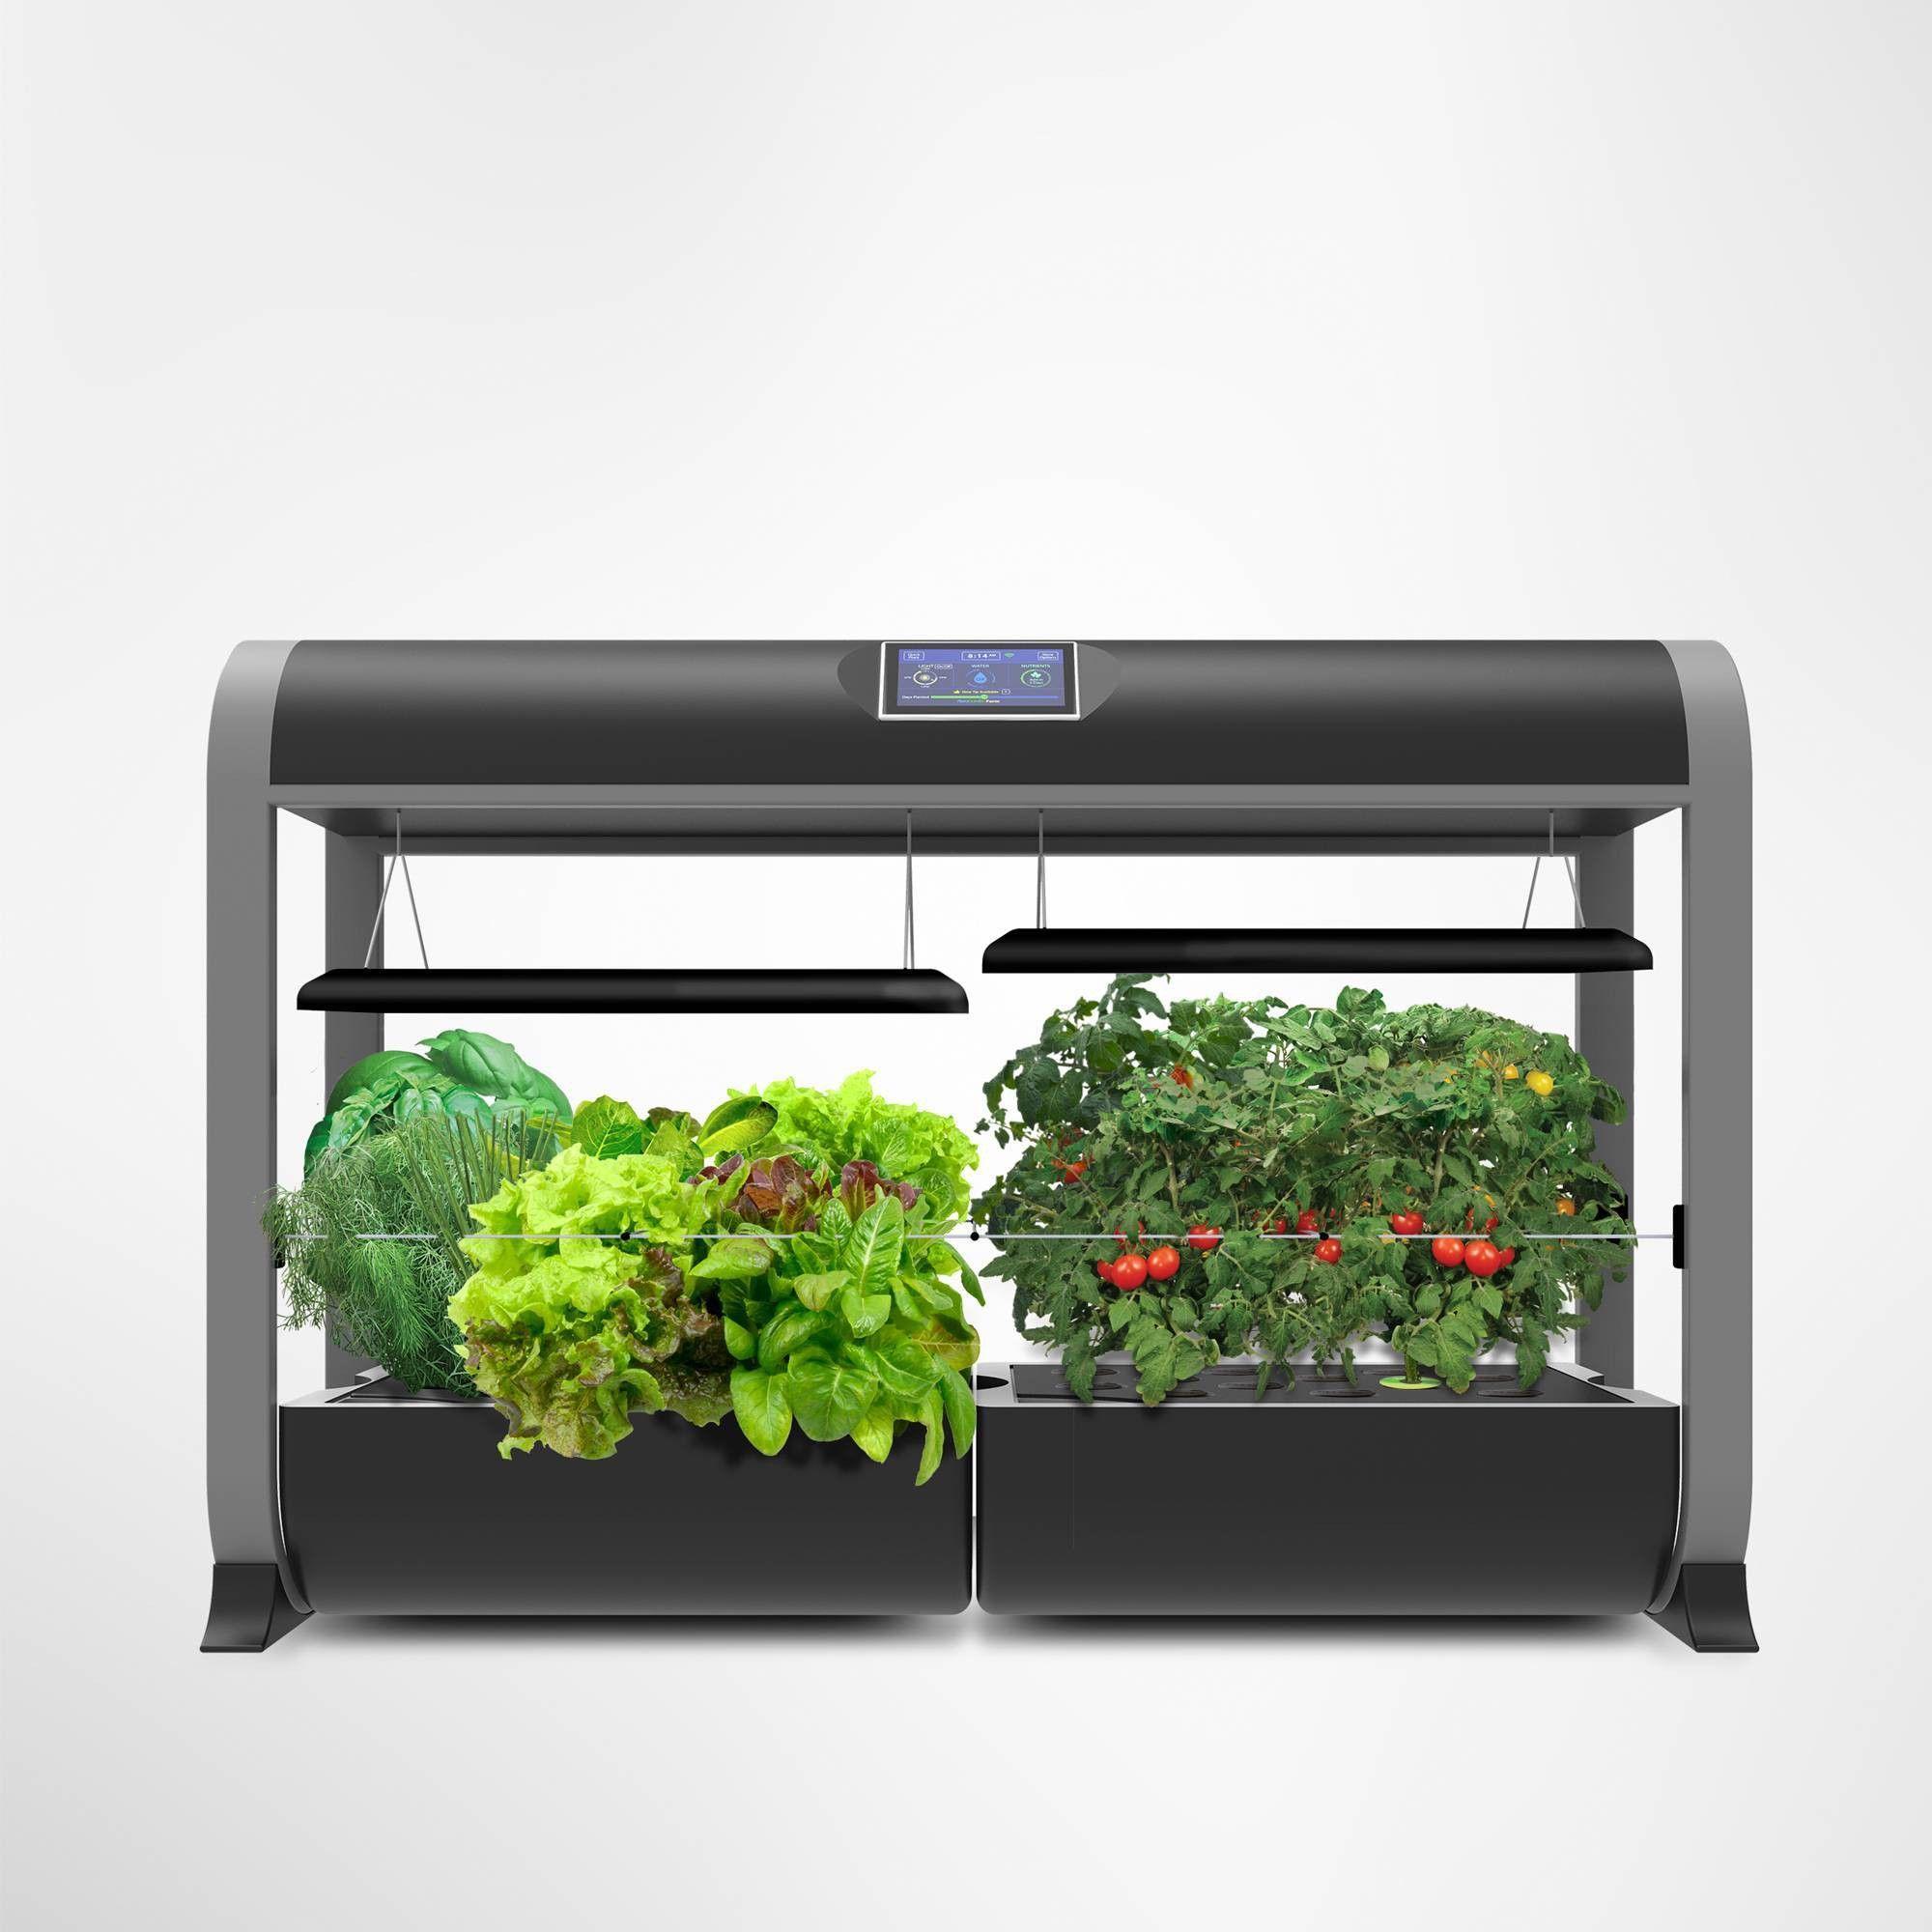 Aerogarden Farm With Salad Bar Seed Kit Black *D*Lt 400 x 300